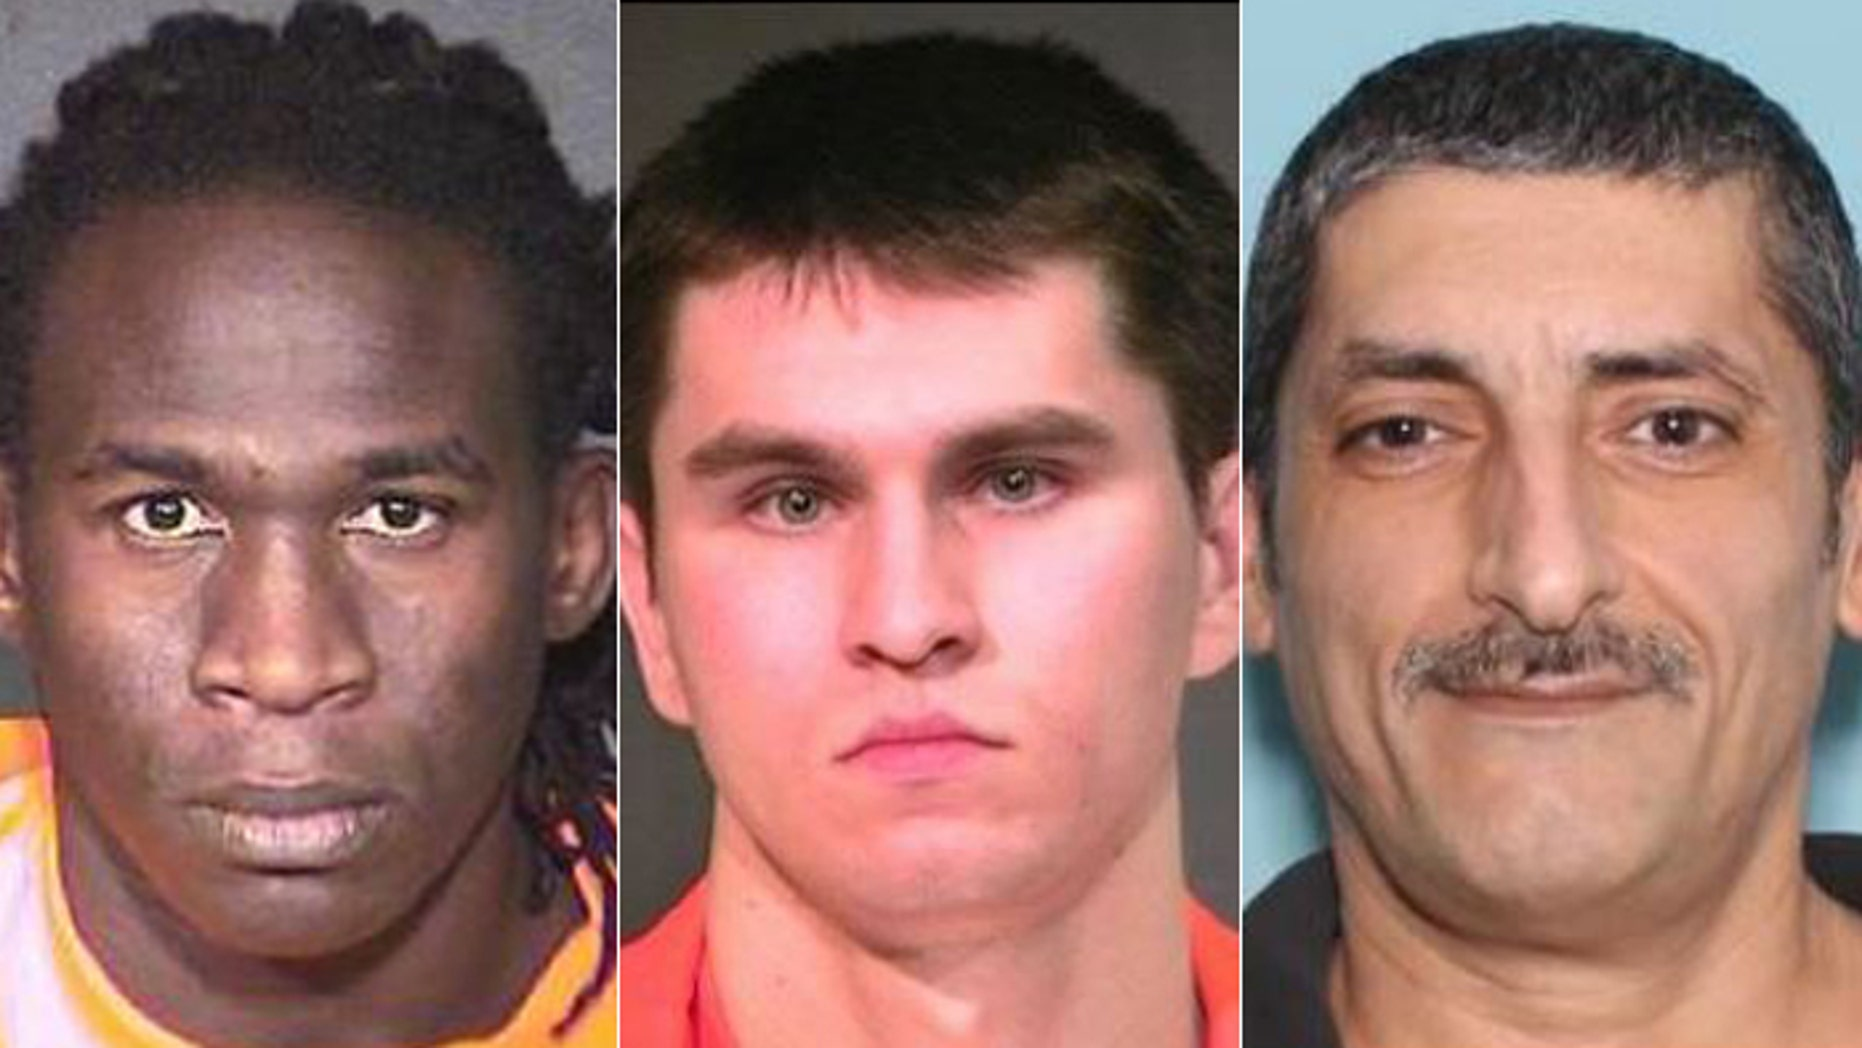 Musa Salah Abdelaziz Abdalla, Dennis Valerievitch Tsoukanov and Nasser Hanna Hermez (l-r.) were all released by ICE officials despite lengthy criminal histories. (Pinal County Sheriff)